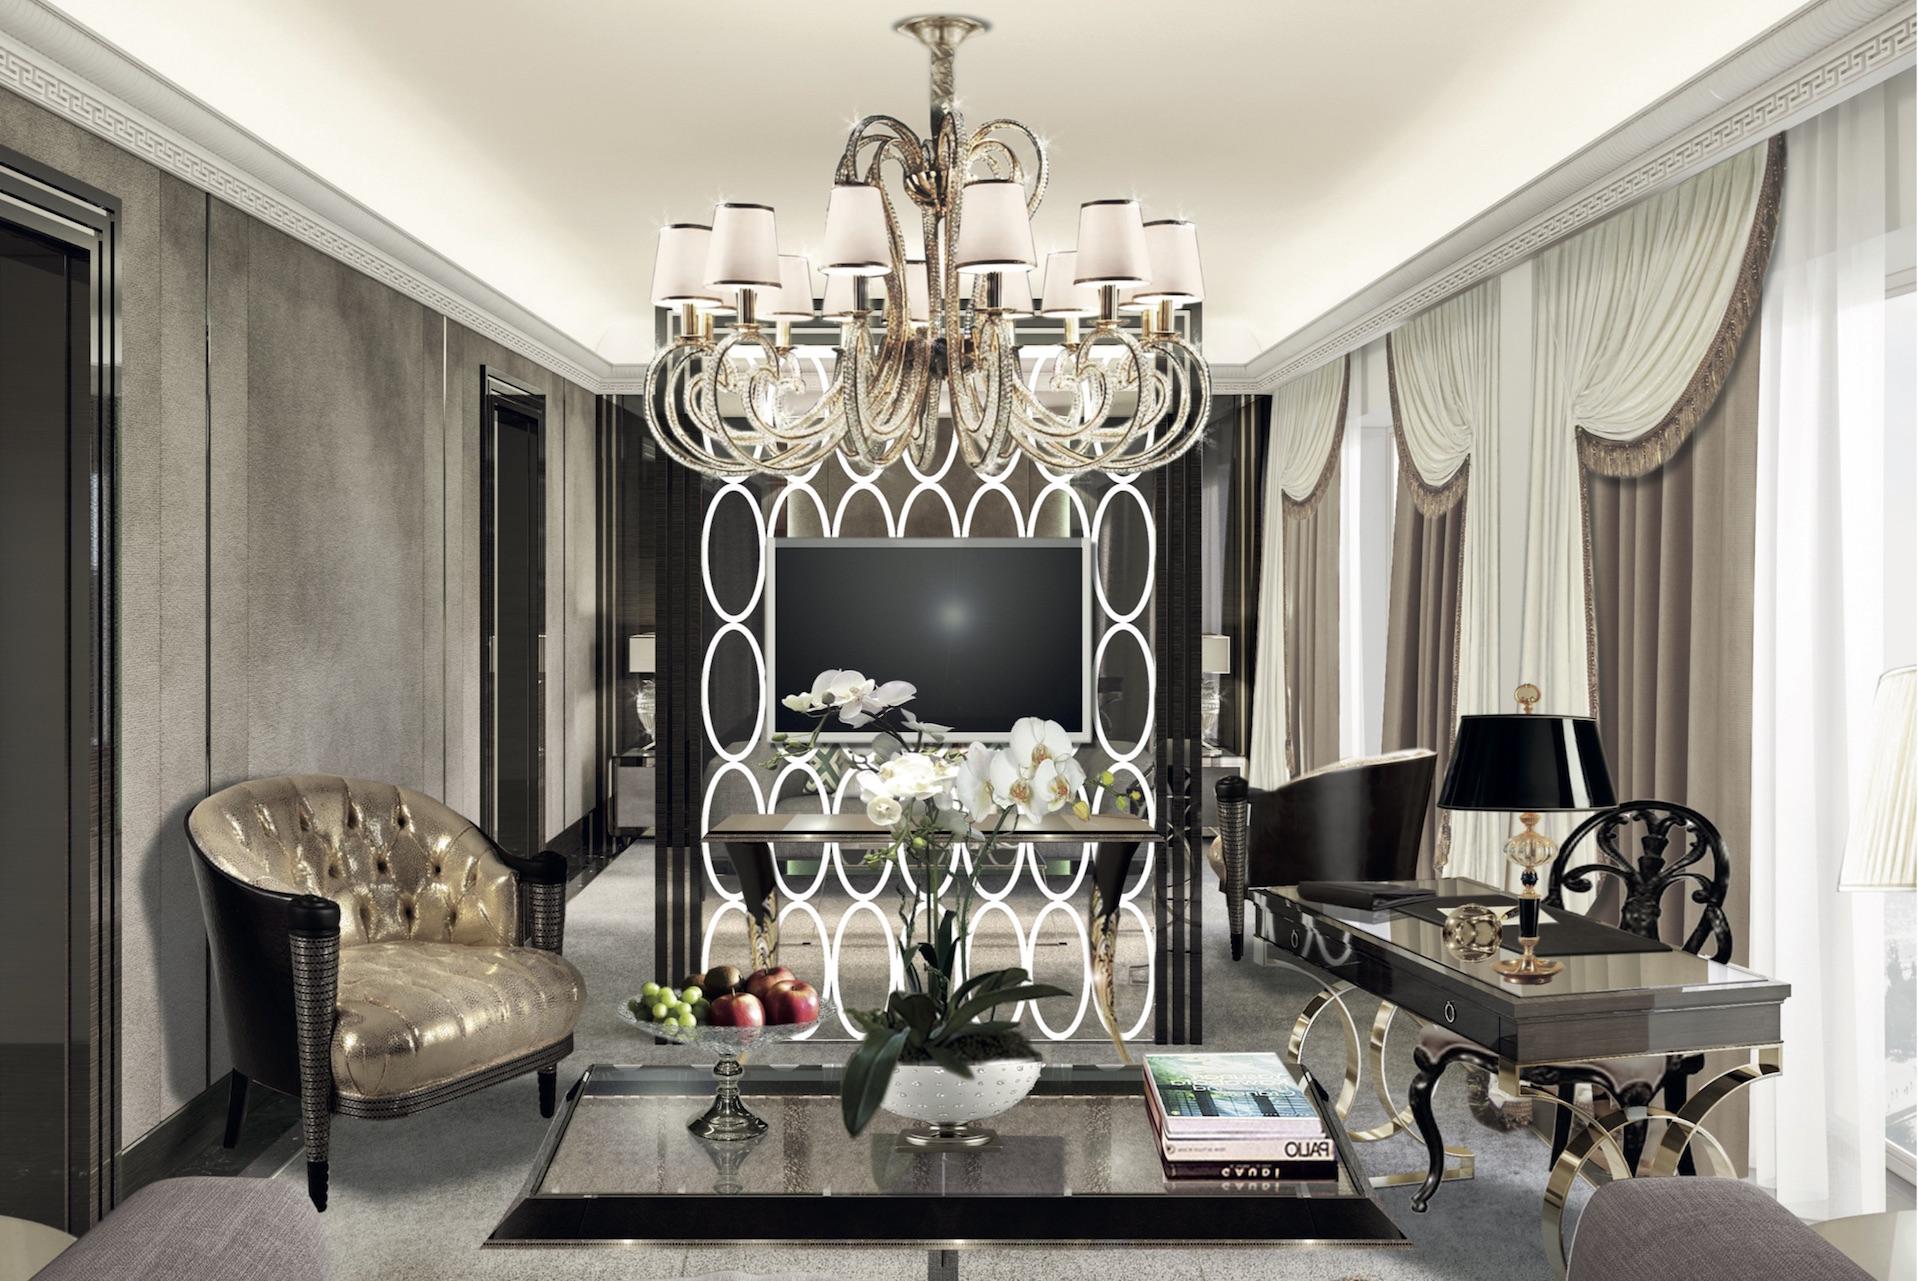 Upscale glamorous living room